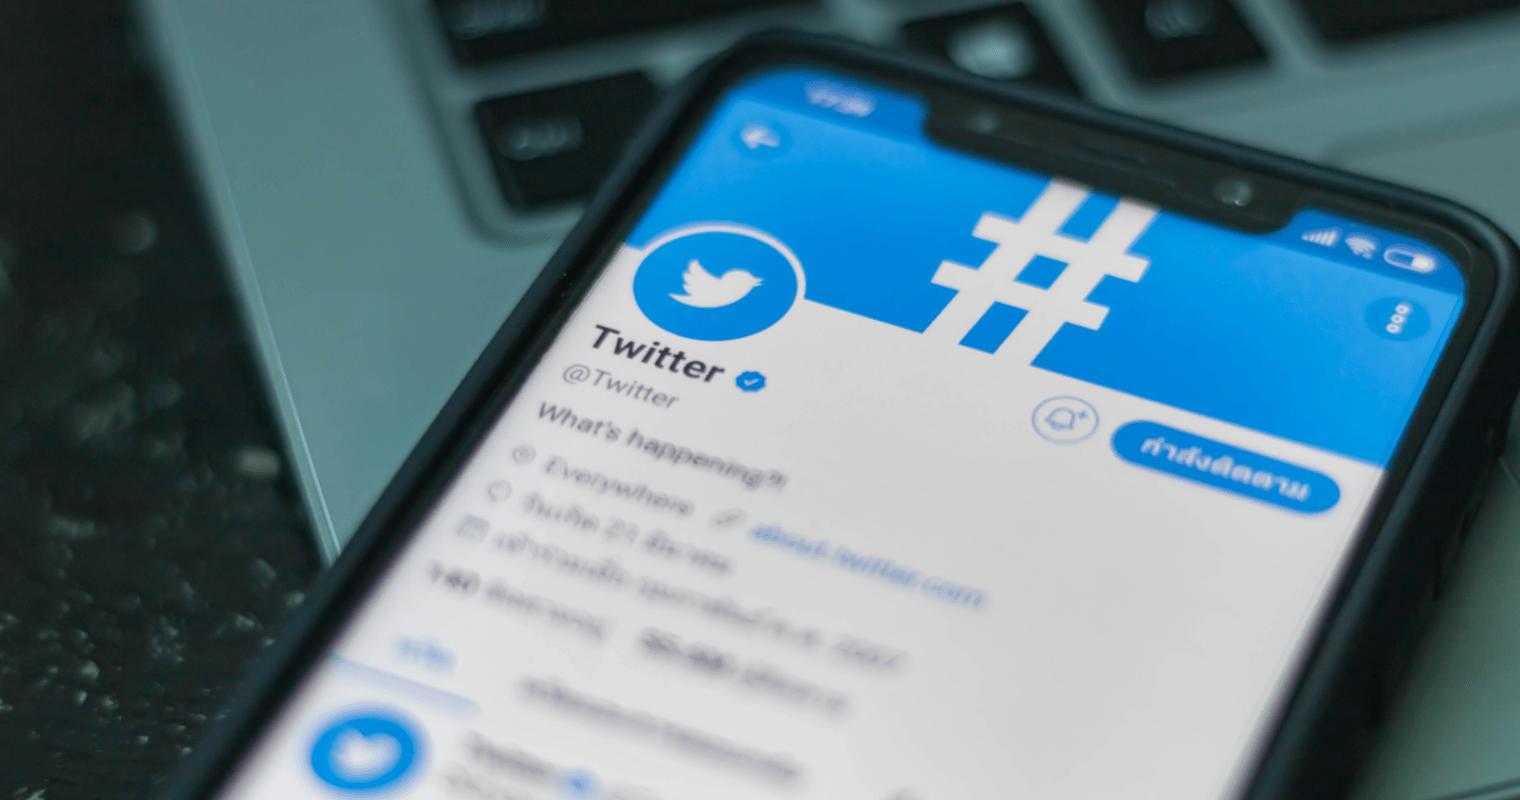 track followers Using the Twitter App